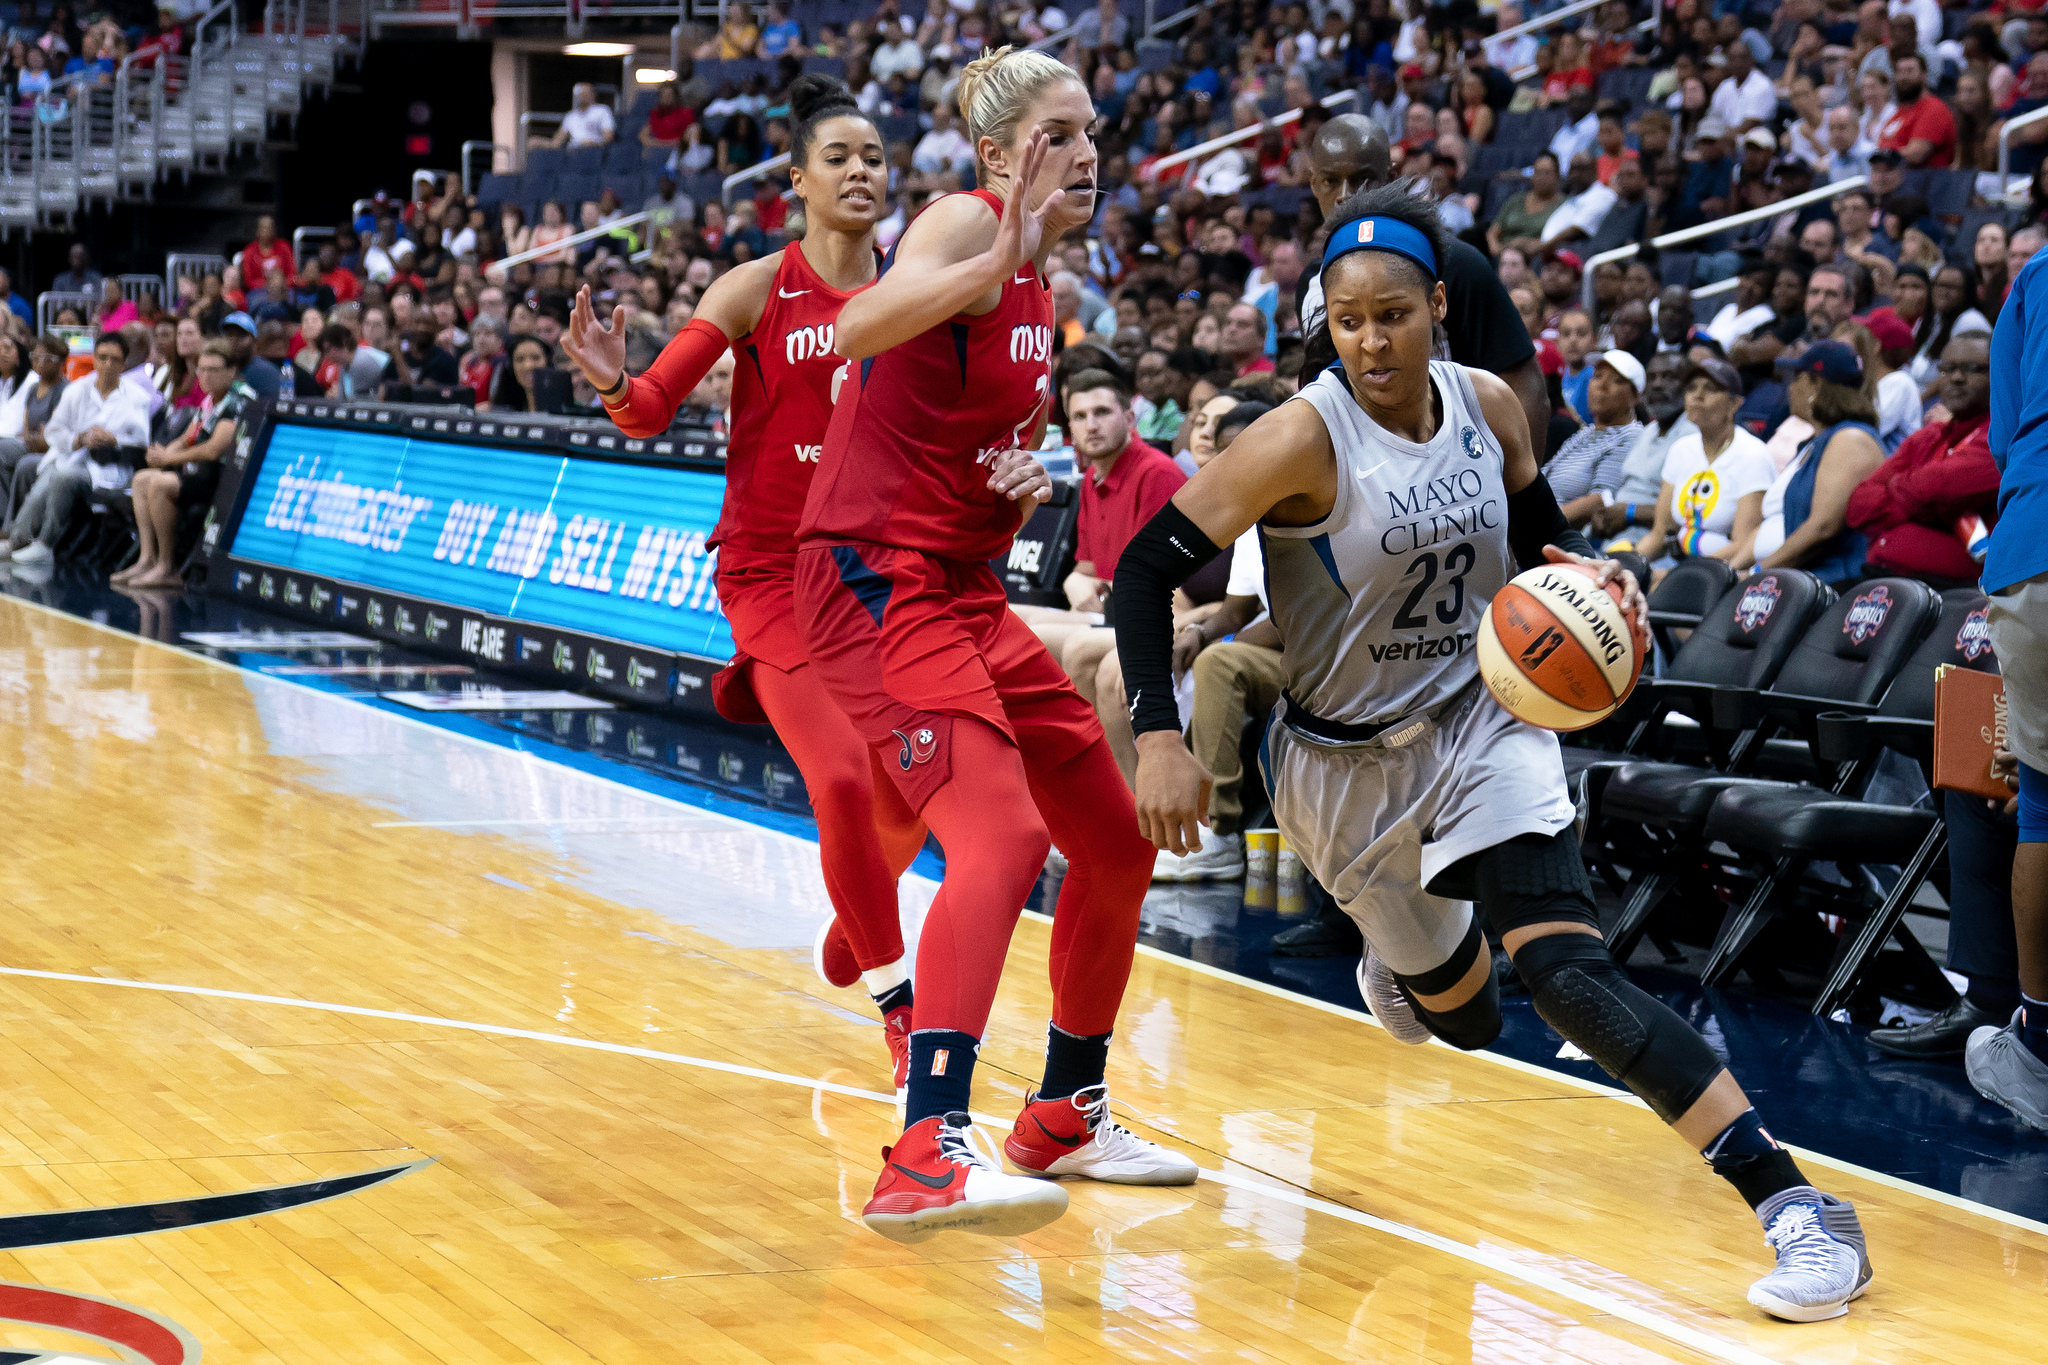 Maya Moore of the Minnesota Lynx dribbles around Washington Mystics Elena Delle Donne